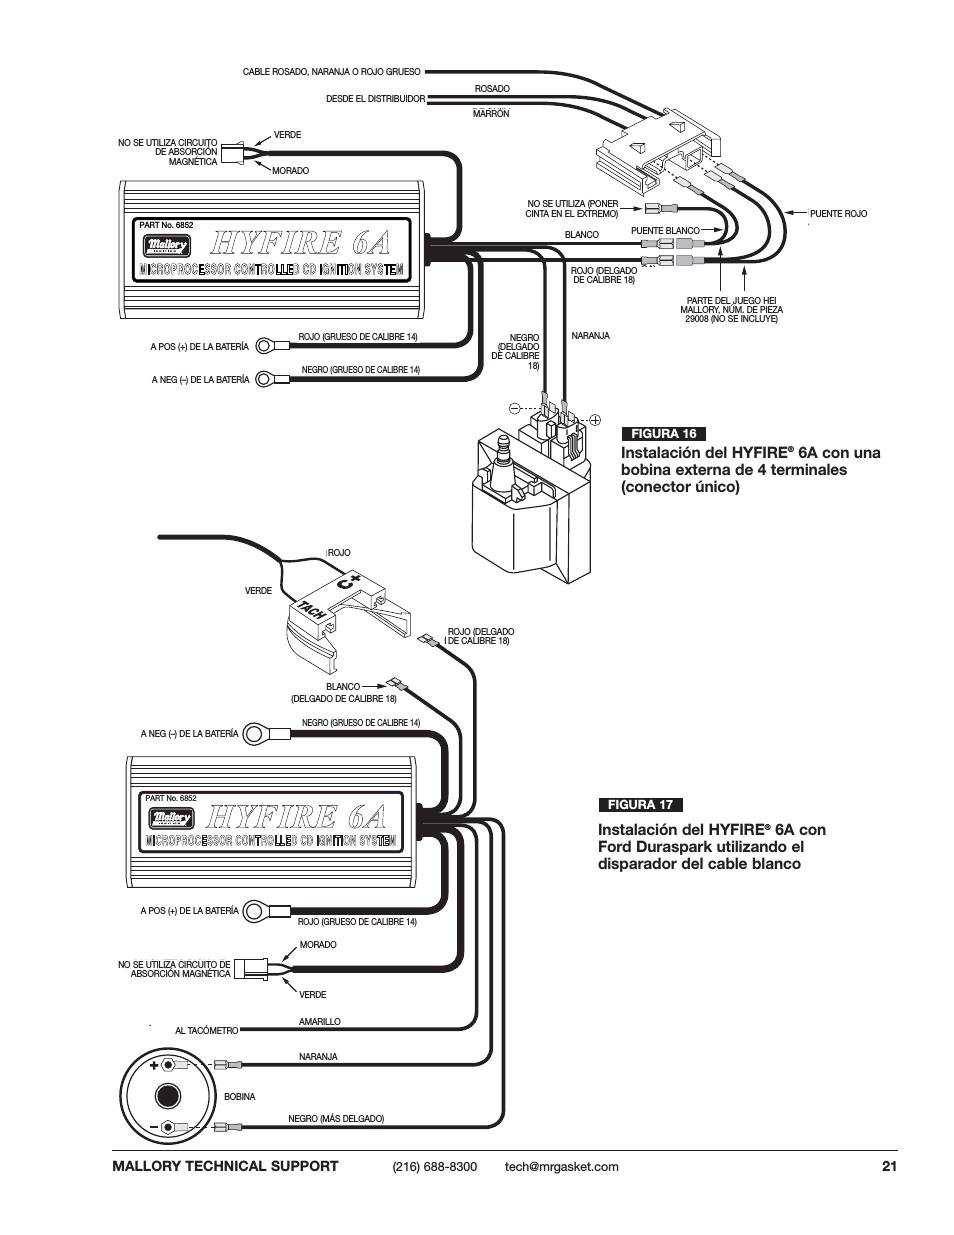 [DIAGRAM] Mallory Hyfire Ignition Wiring Diagram FULL